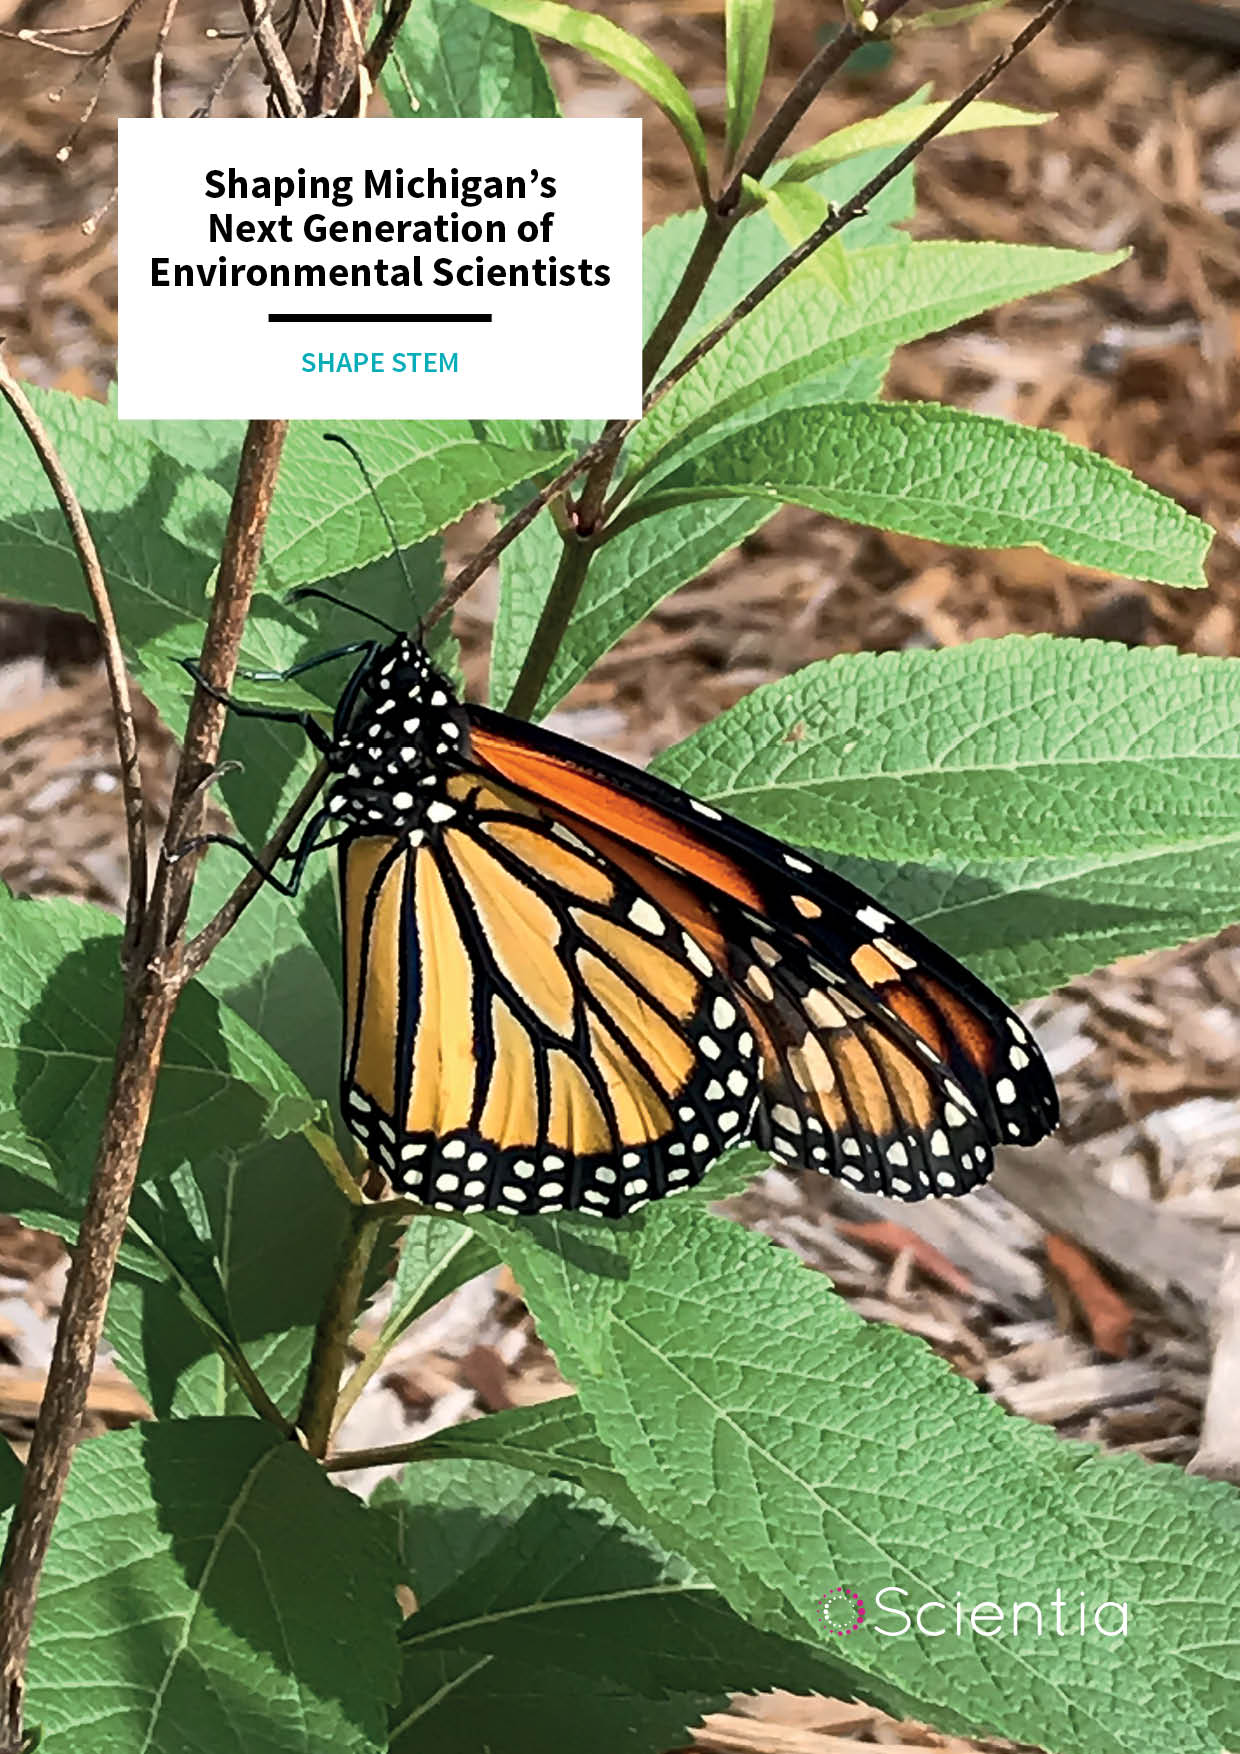 SHAPE STEM – Shaping Michigan's Next Generation of Environmental Scientists